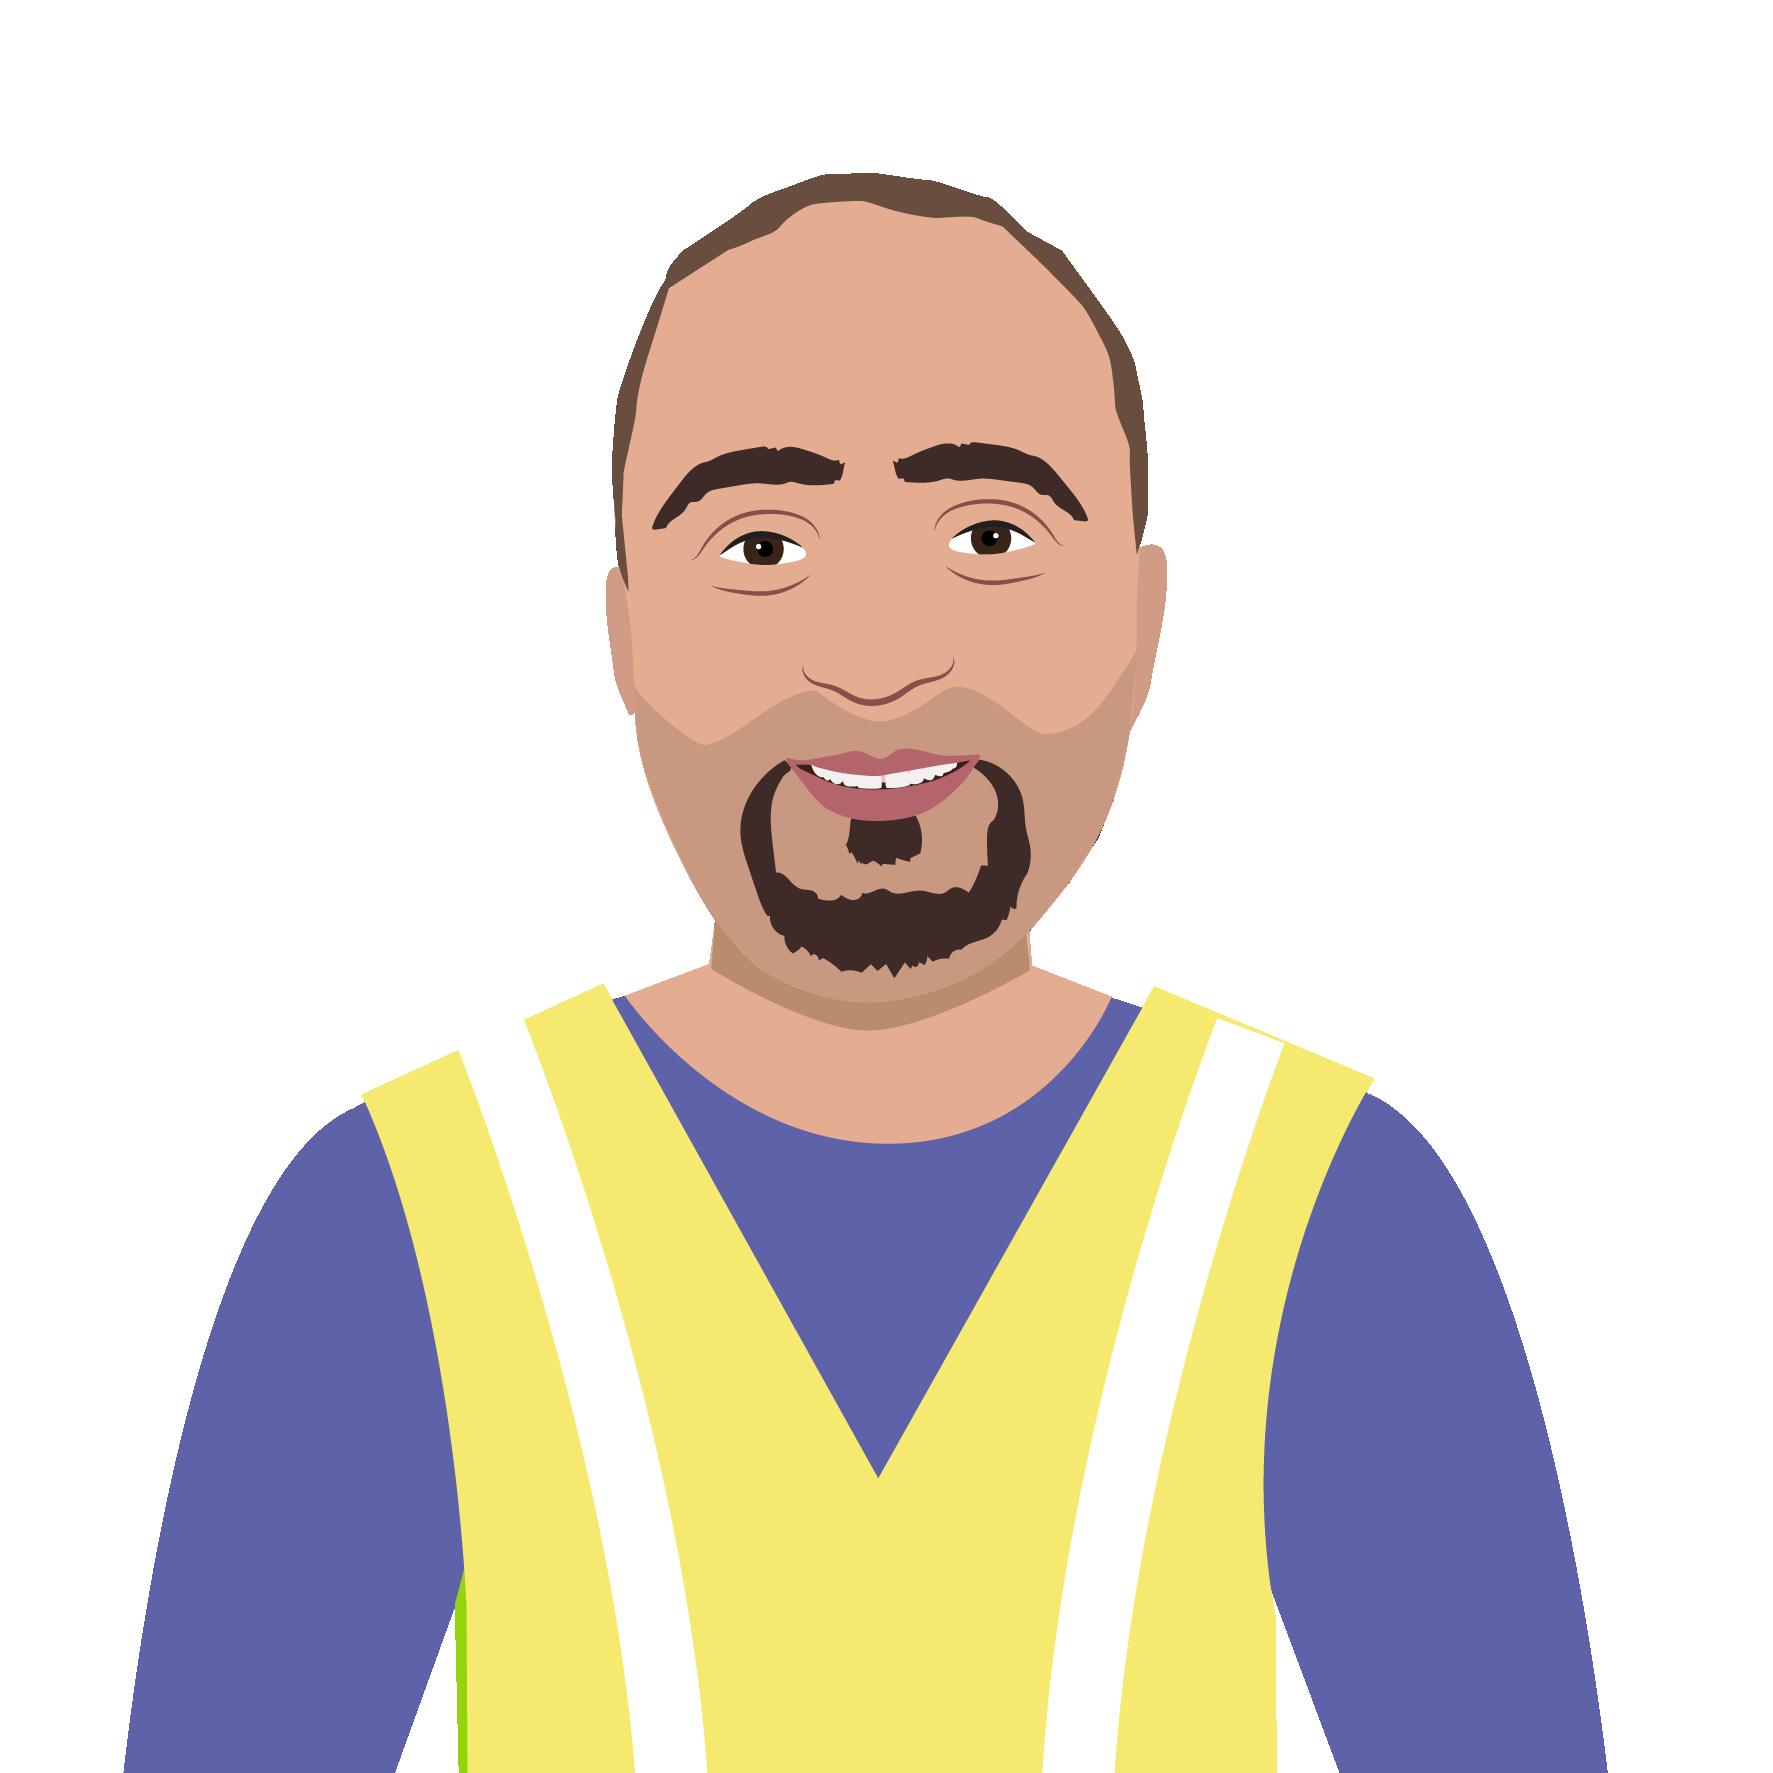 jaquier_habefast_illu_employes-1773x1773-site_Plan de travail 1 copie 11